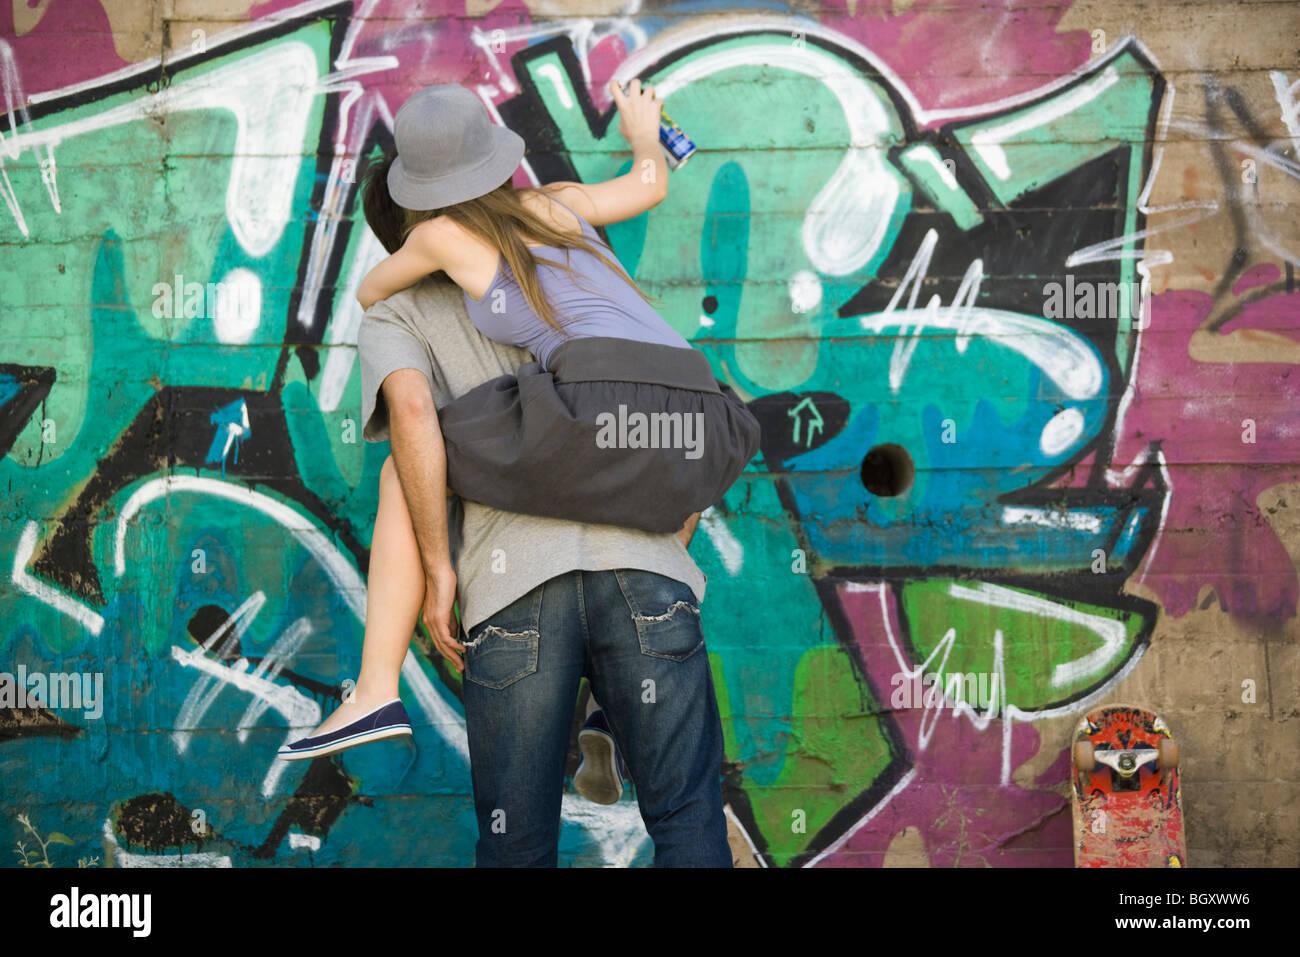 Young Woman Straddling Companions Back Spray Painting Graffiti Mural